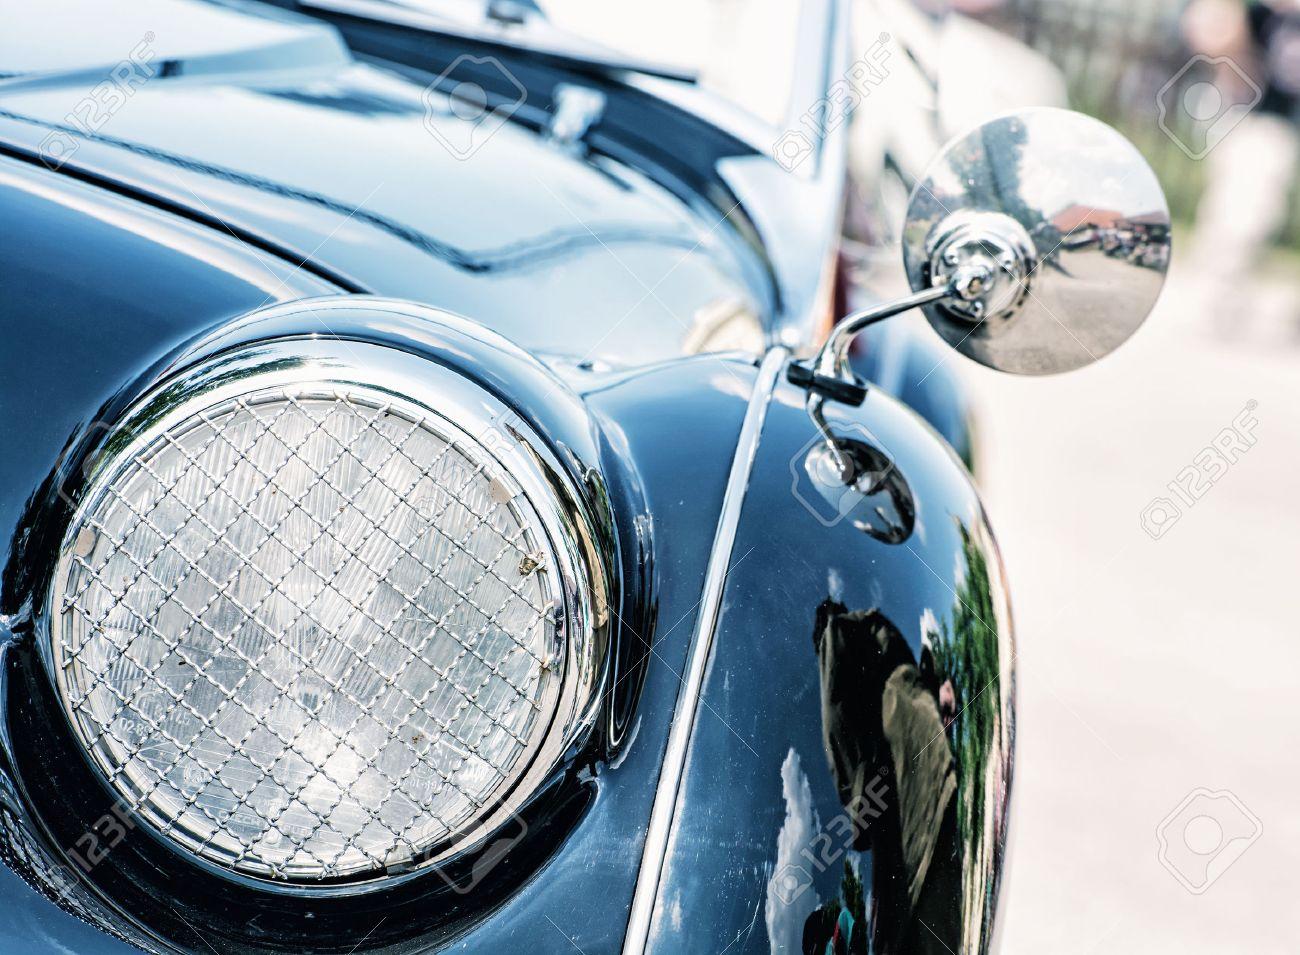 Shiny blue vintage car. Detail view of the headlight. Retro car. Front light. Retro automobile scene. Circle headlamp. - 58033487